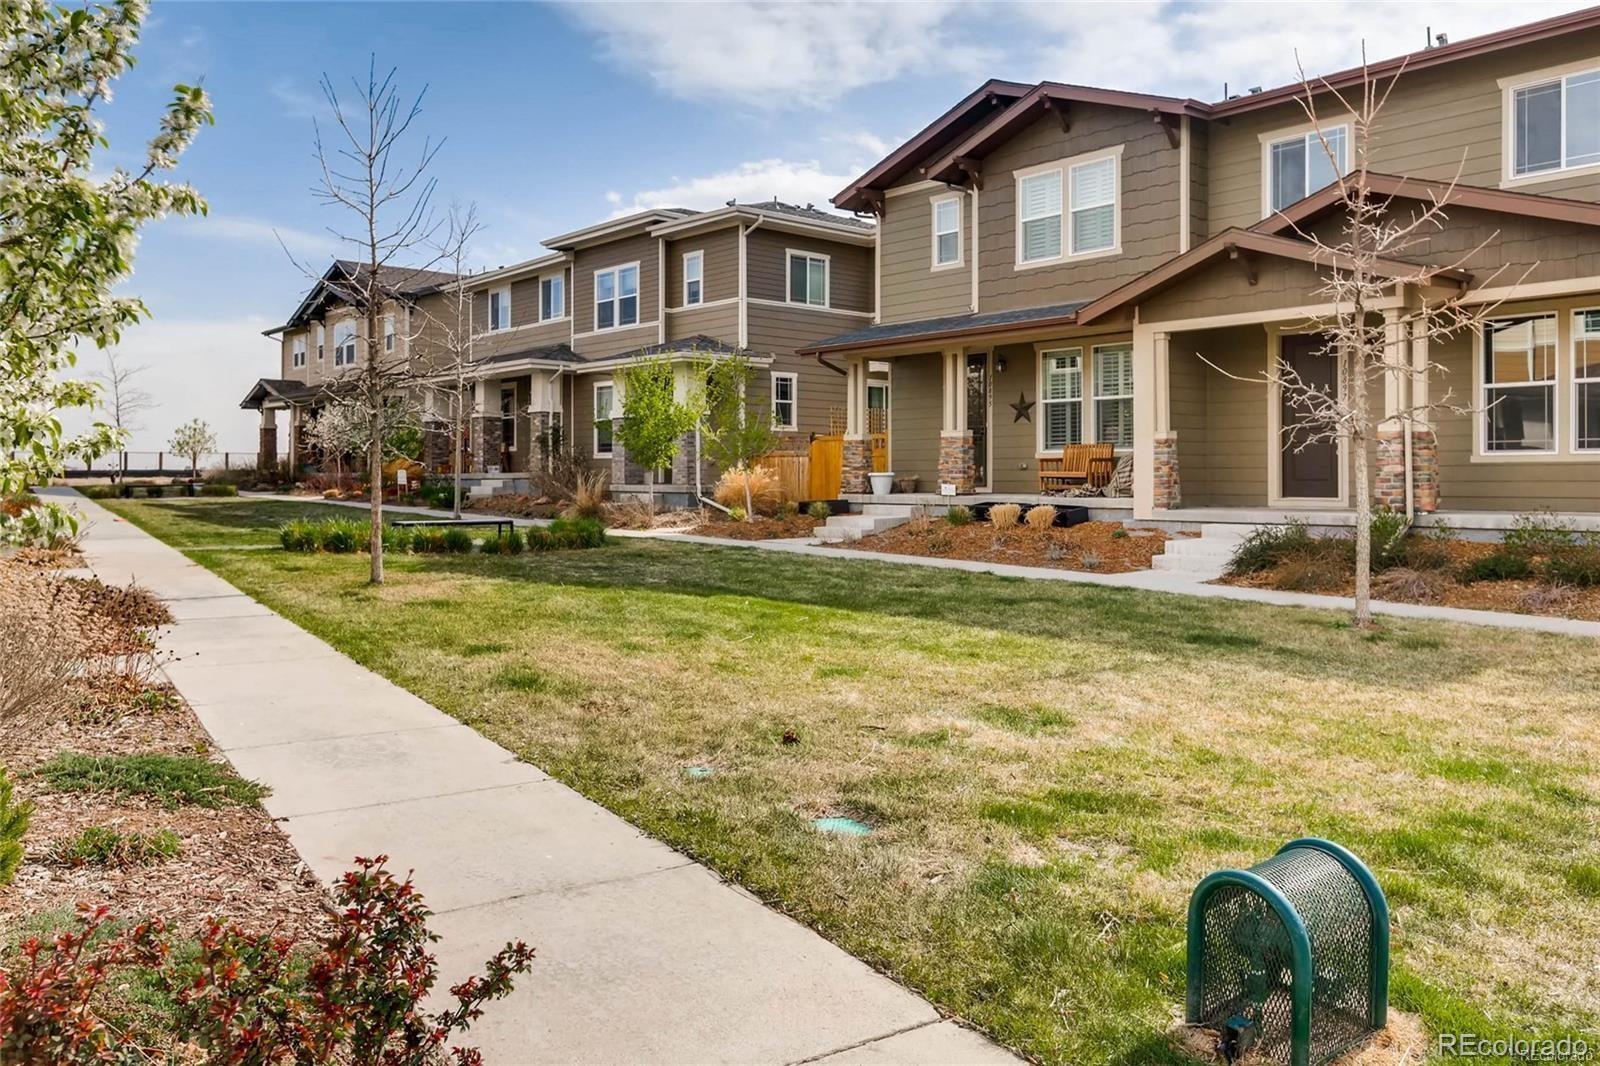 MLS# 4385066 - 21 - 10881 E 28th Place, Denver, CO 80238